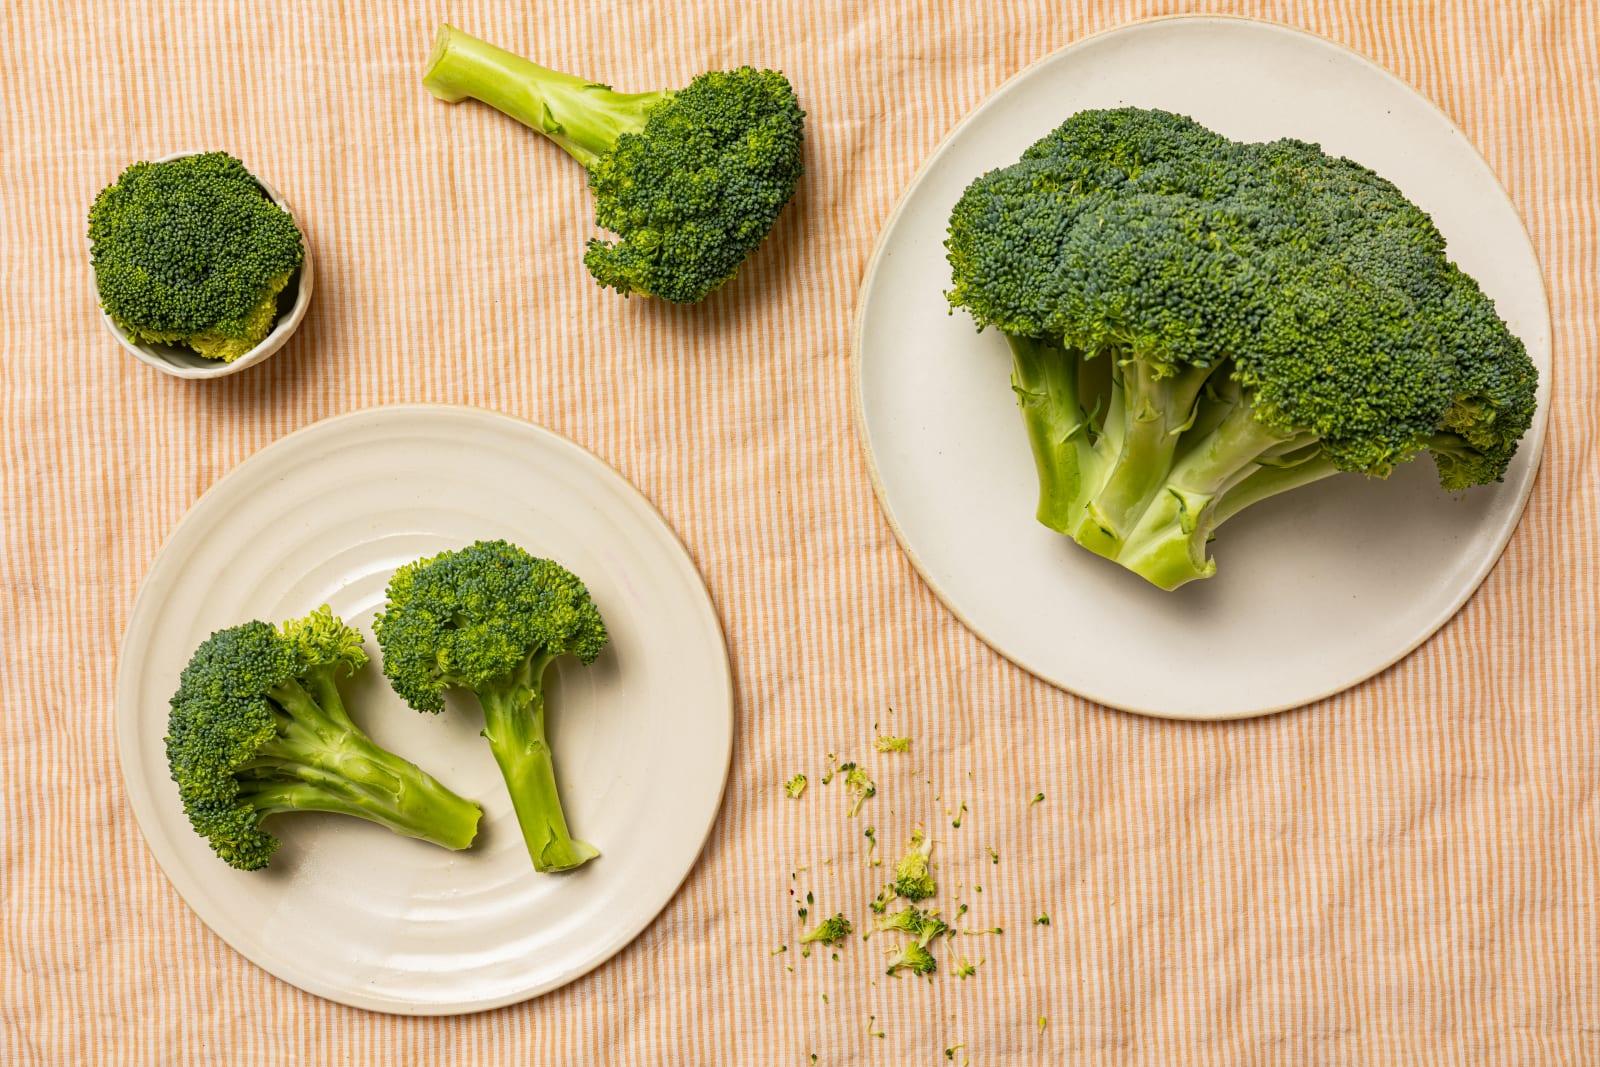 Yumi Broccoli ingredients image